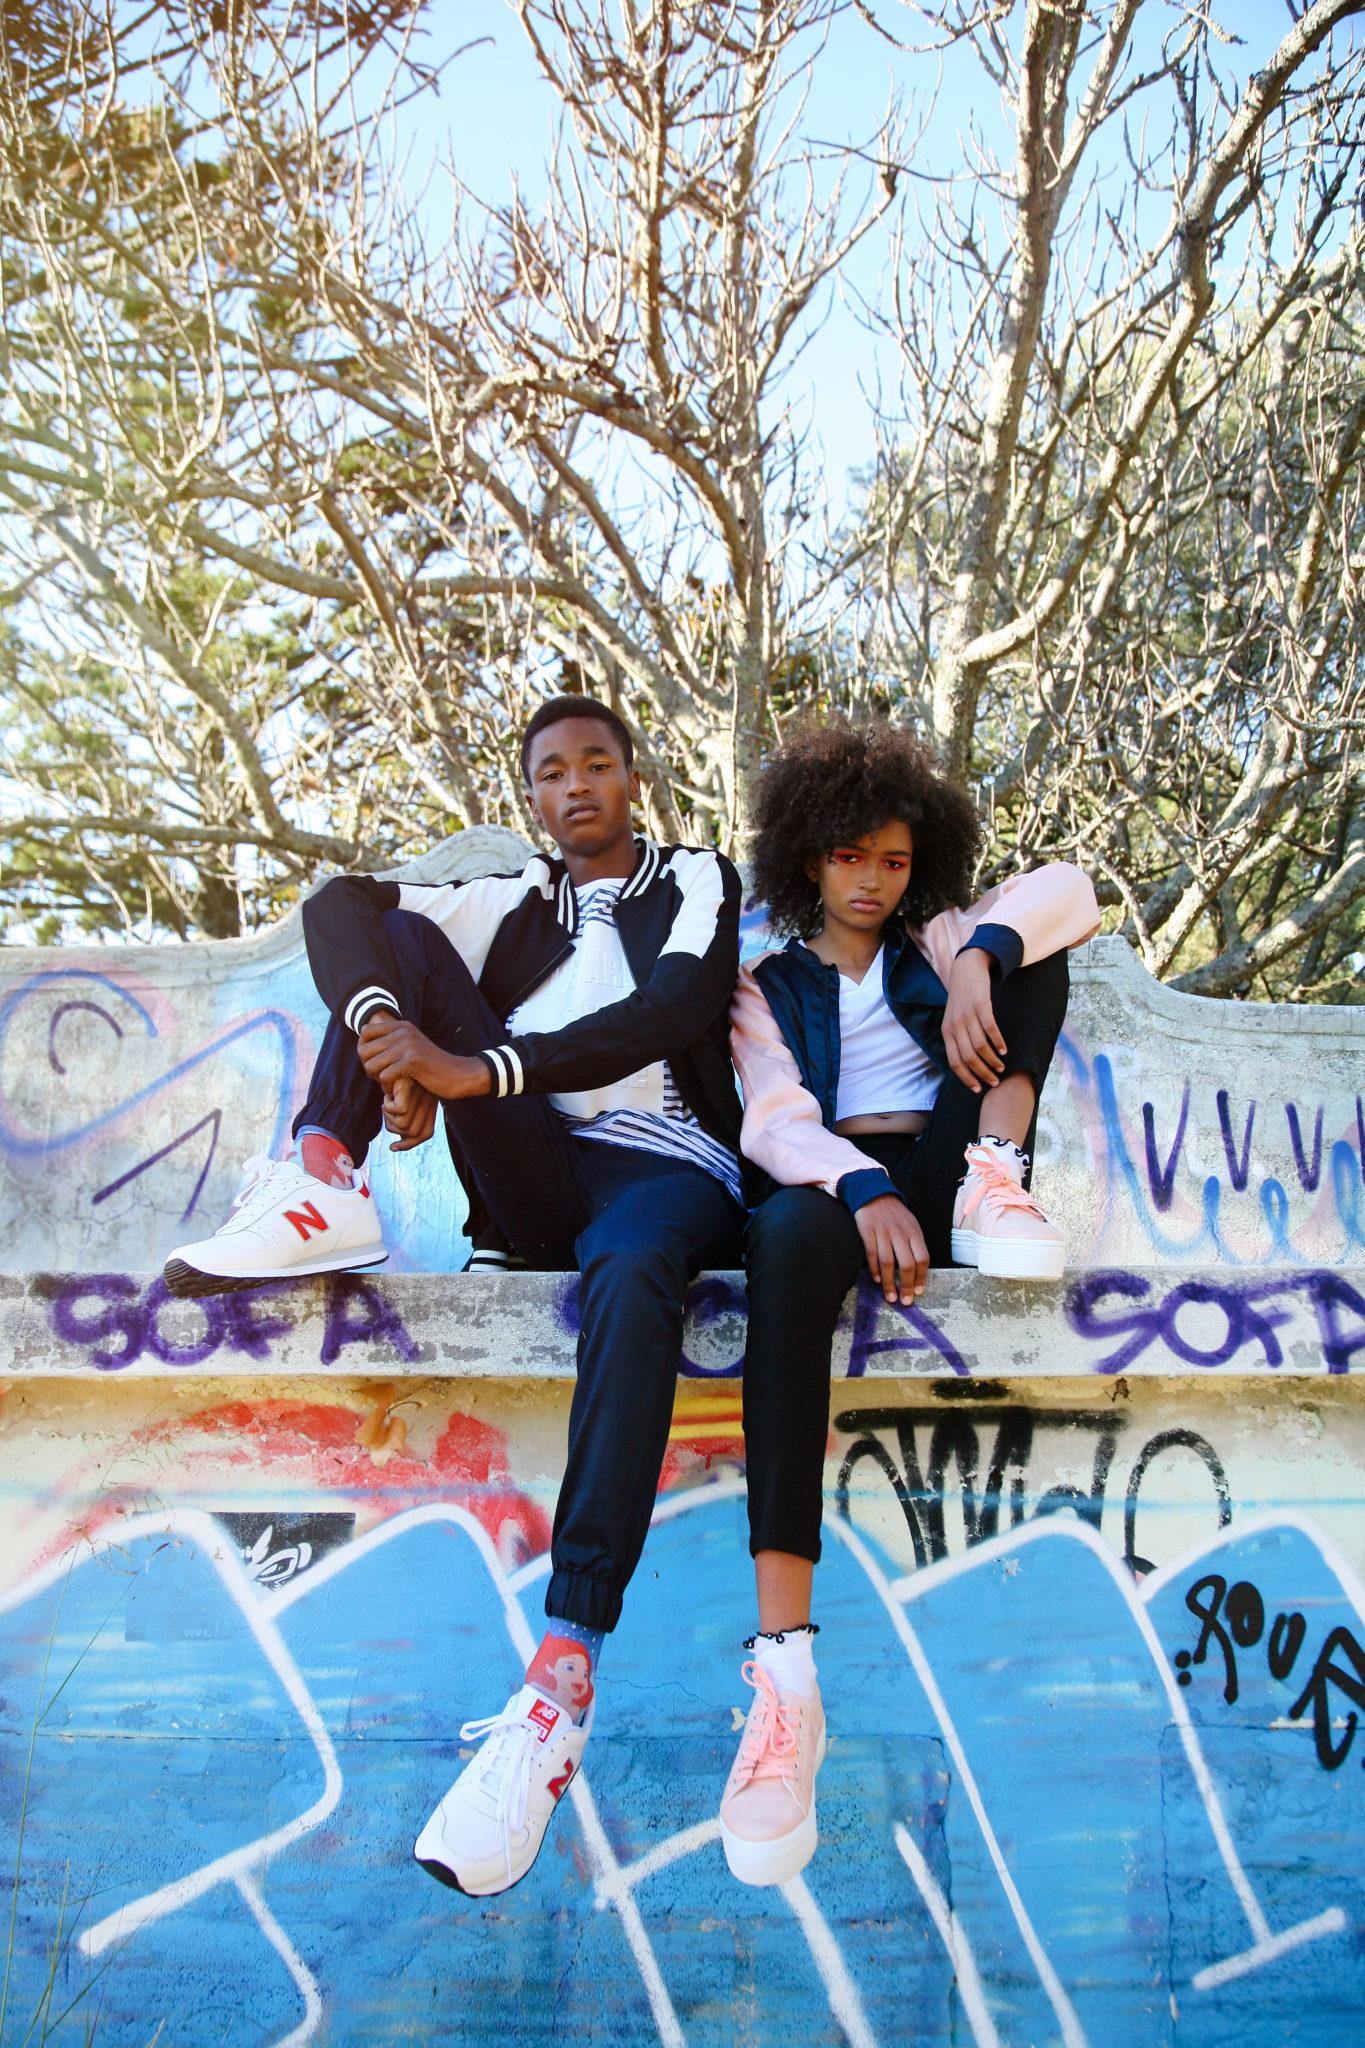 Youth Run Spree Campaign